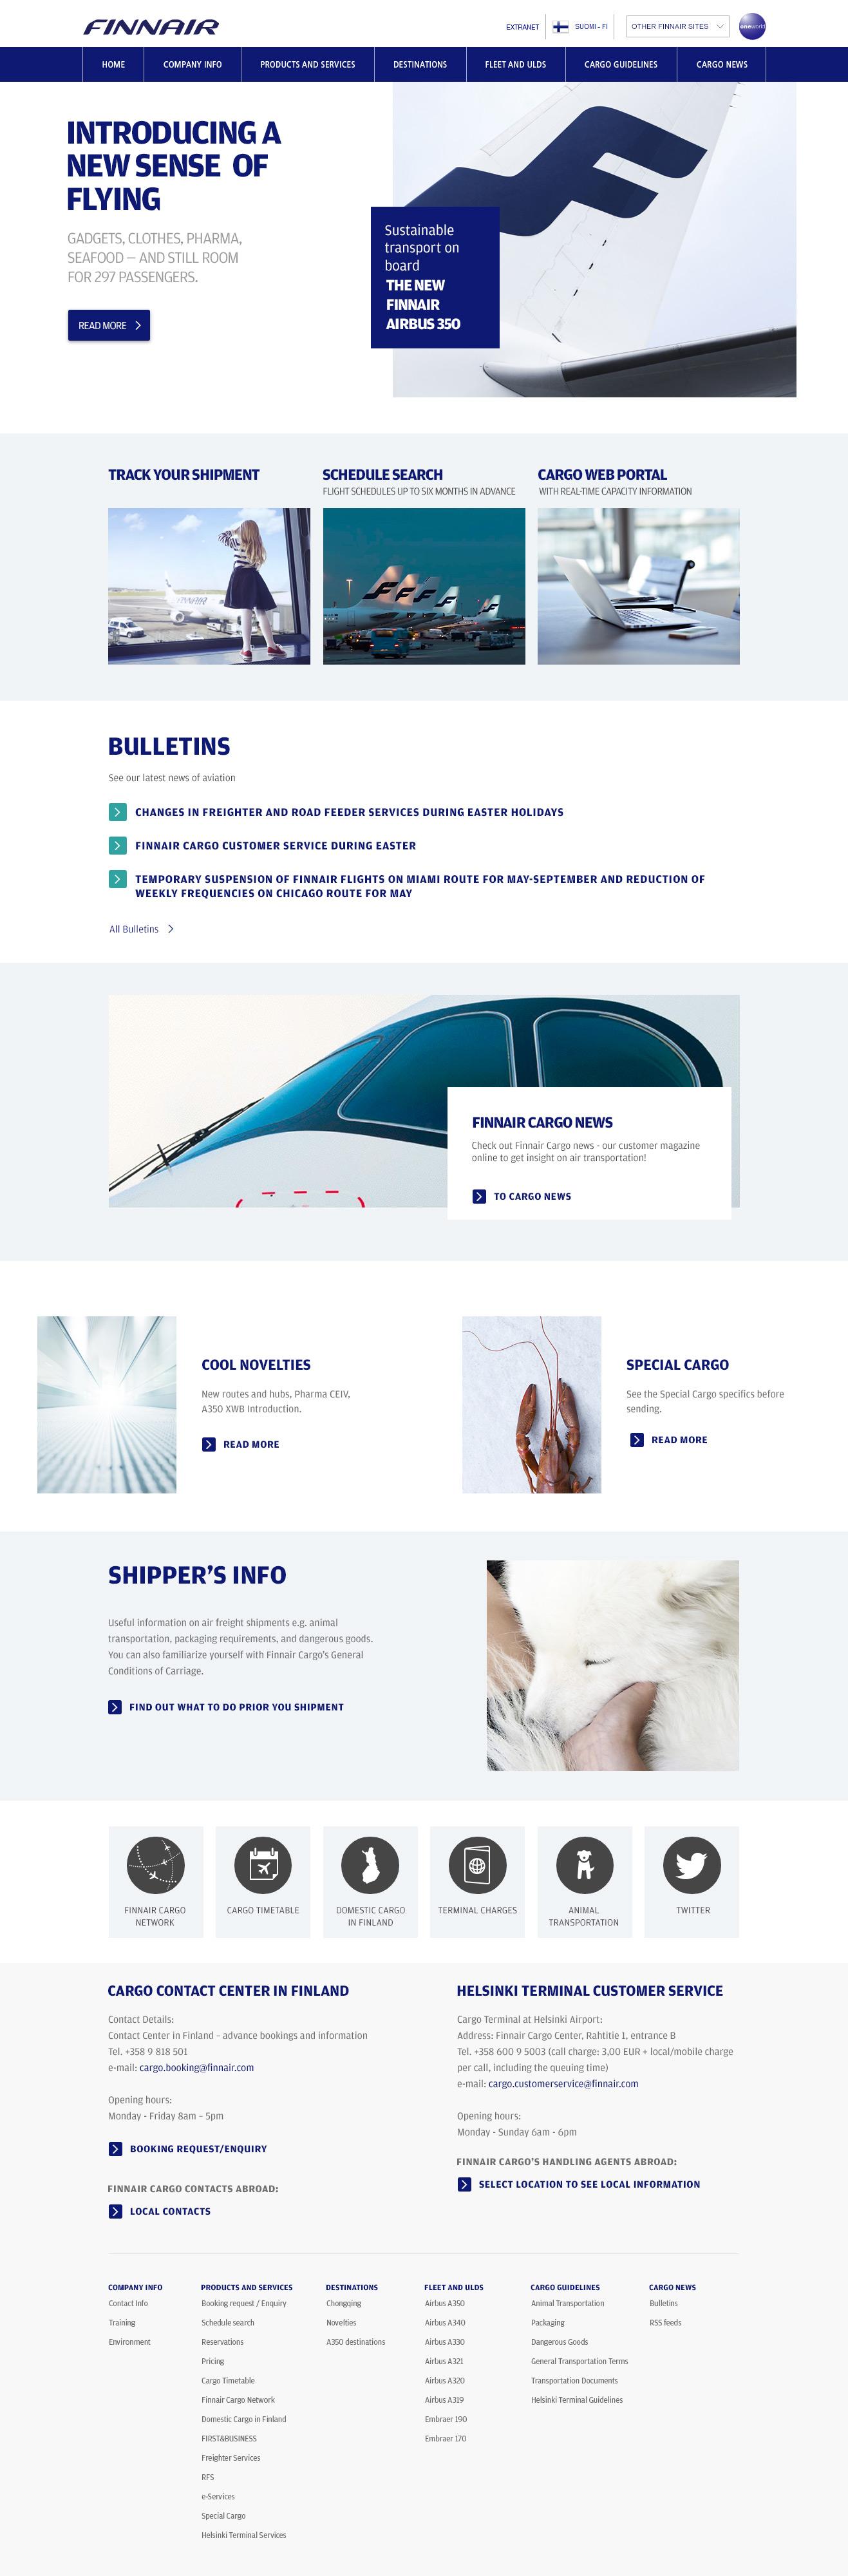 finnaircargo.com homepage